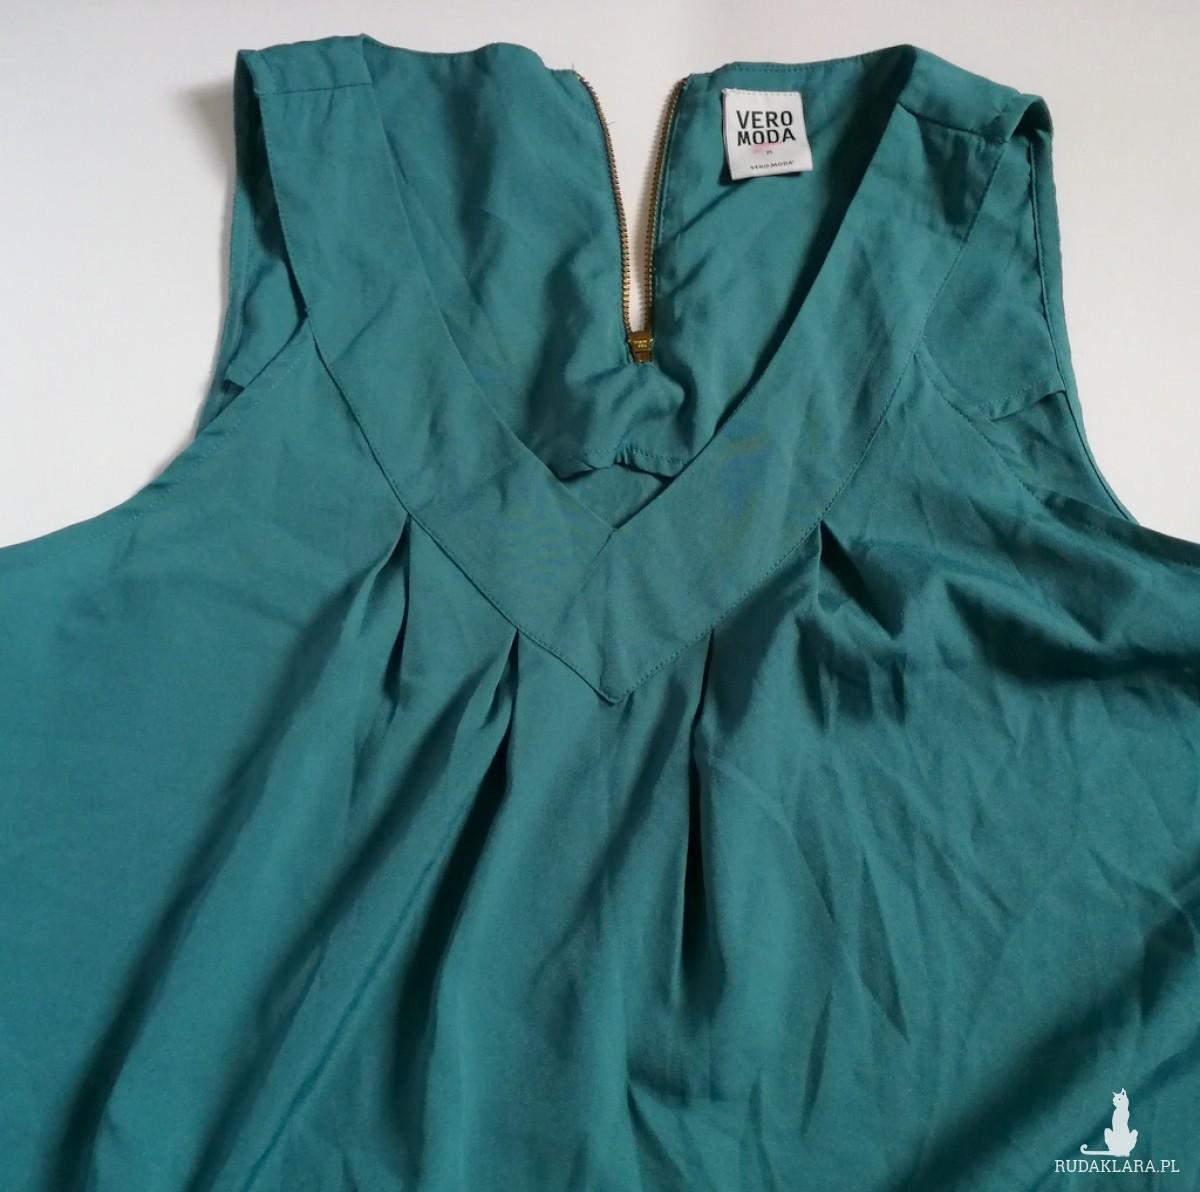 bluzka turkusowa firma vero moda rozmiar M